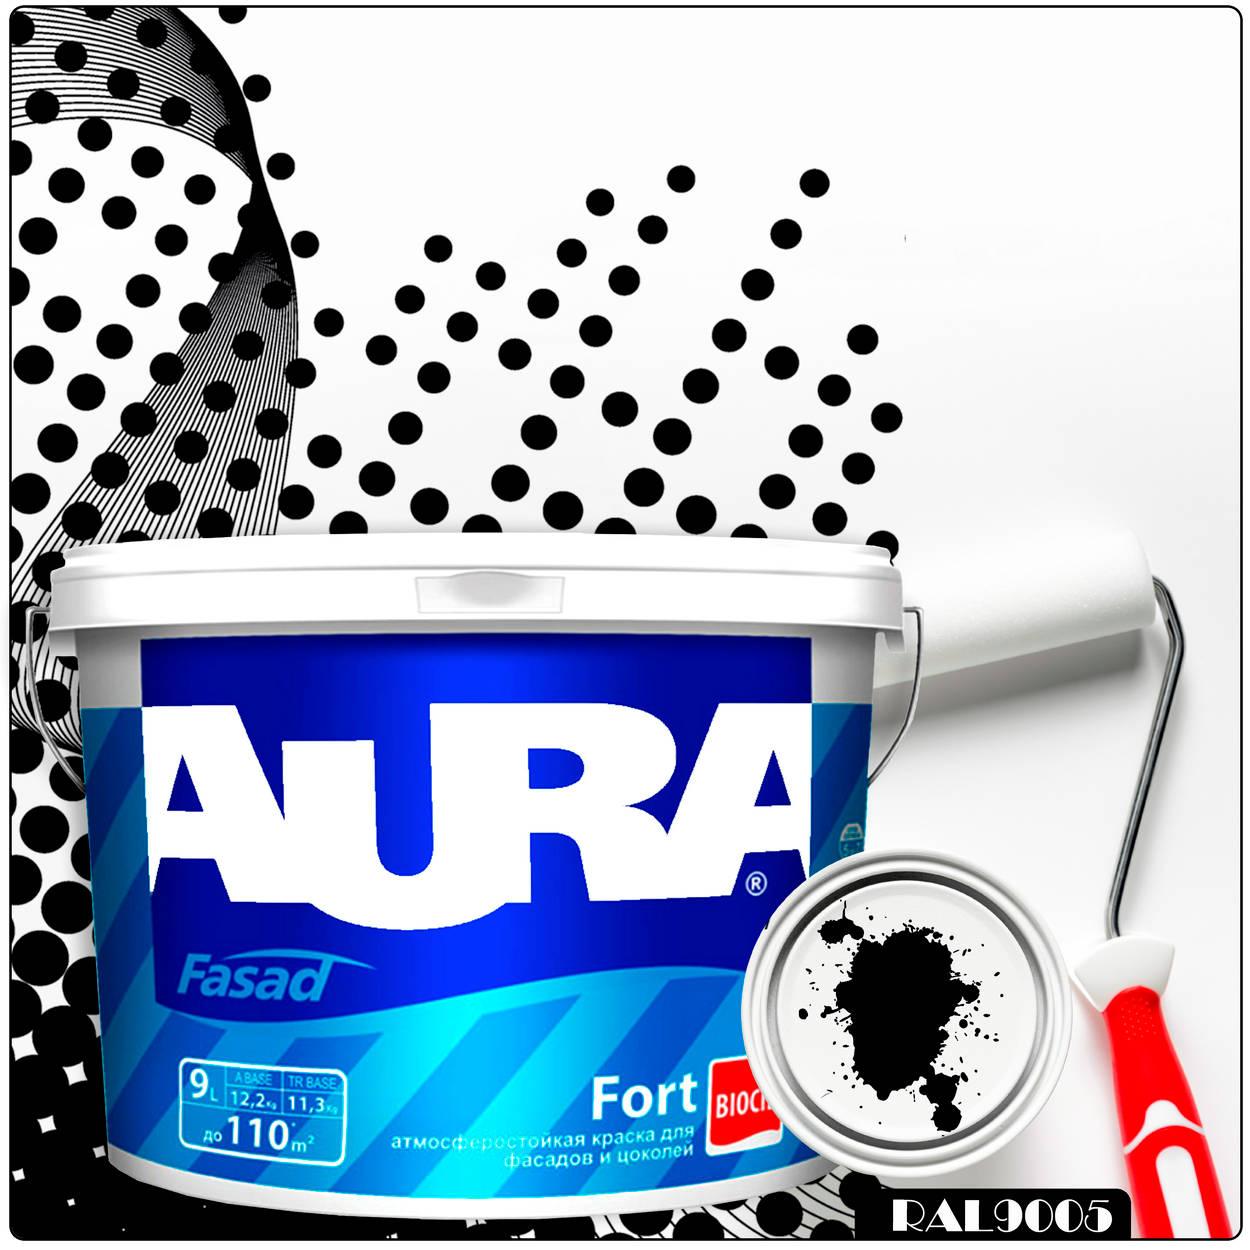 Фото 5 - Краска Aura Fasad Fort, RAL 9005 Черный янтарь, латексная, матовая, для фасада и цоколей, 9л, Аура.